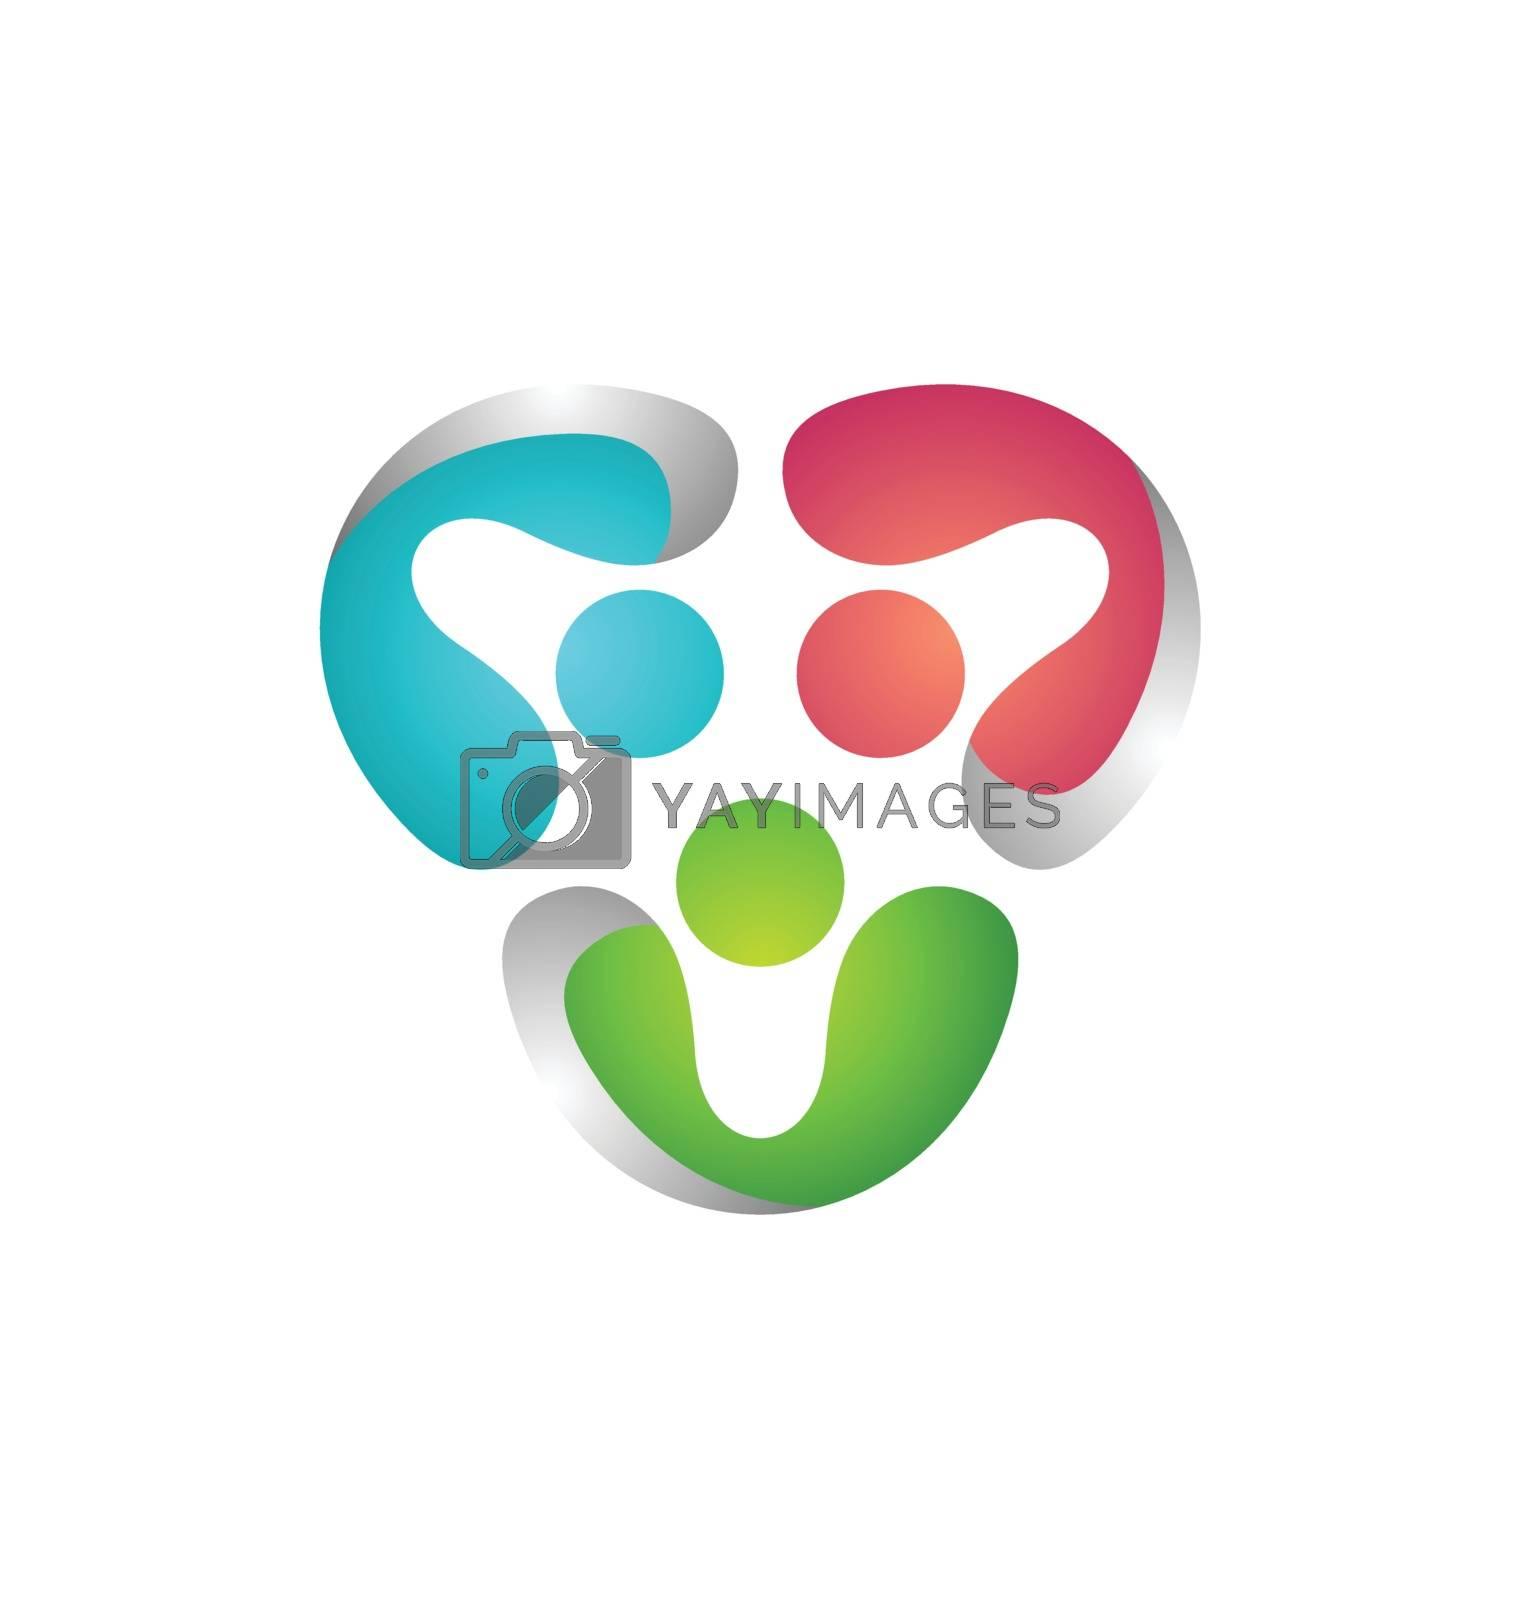 modern global teamwork logo symbol icon vector design illustration